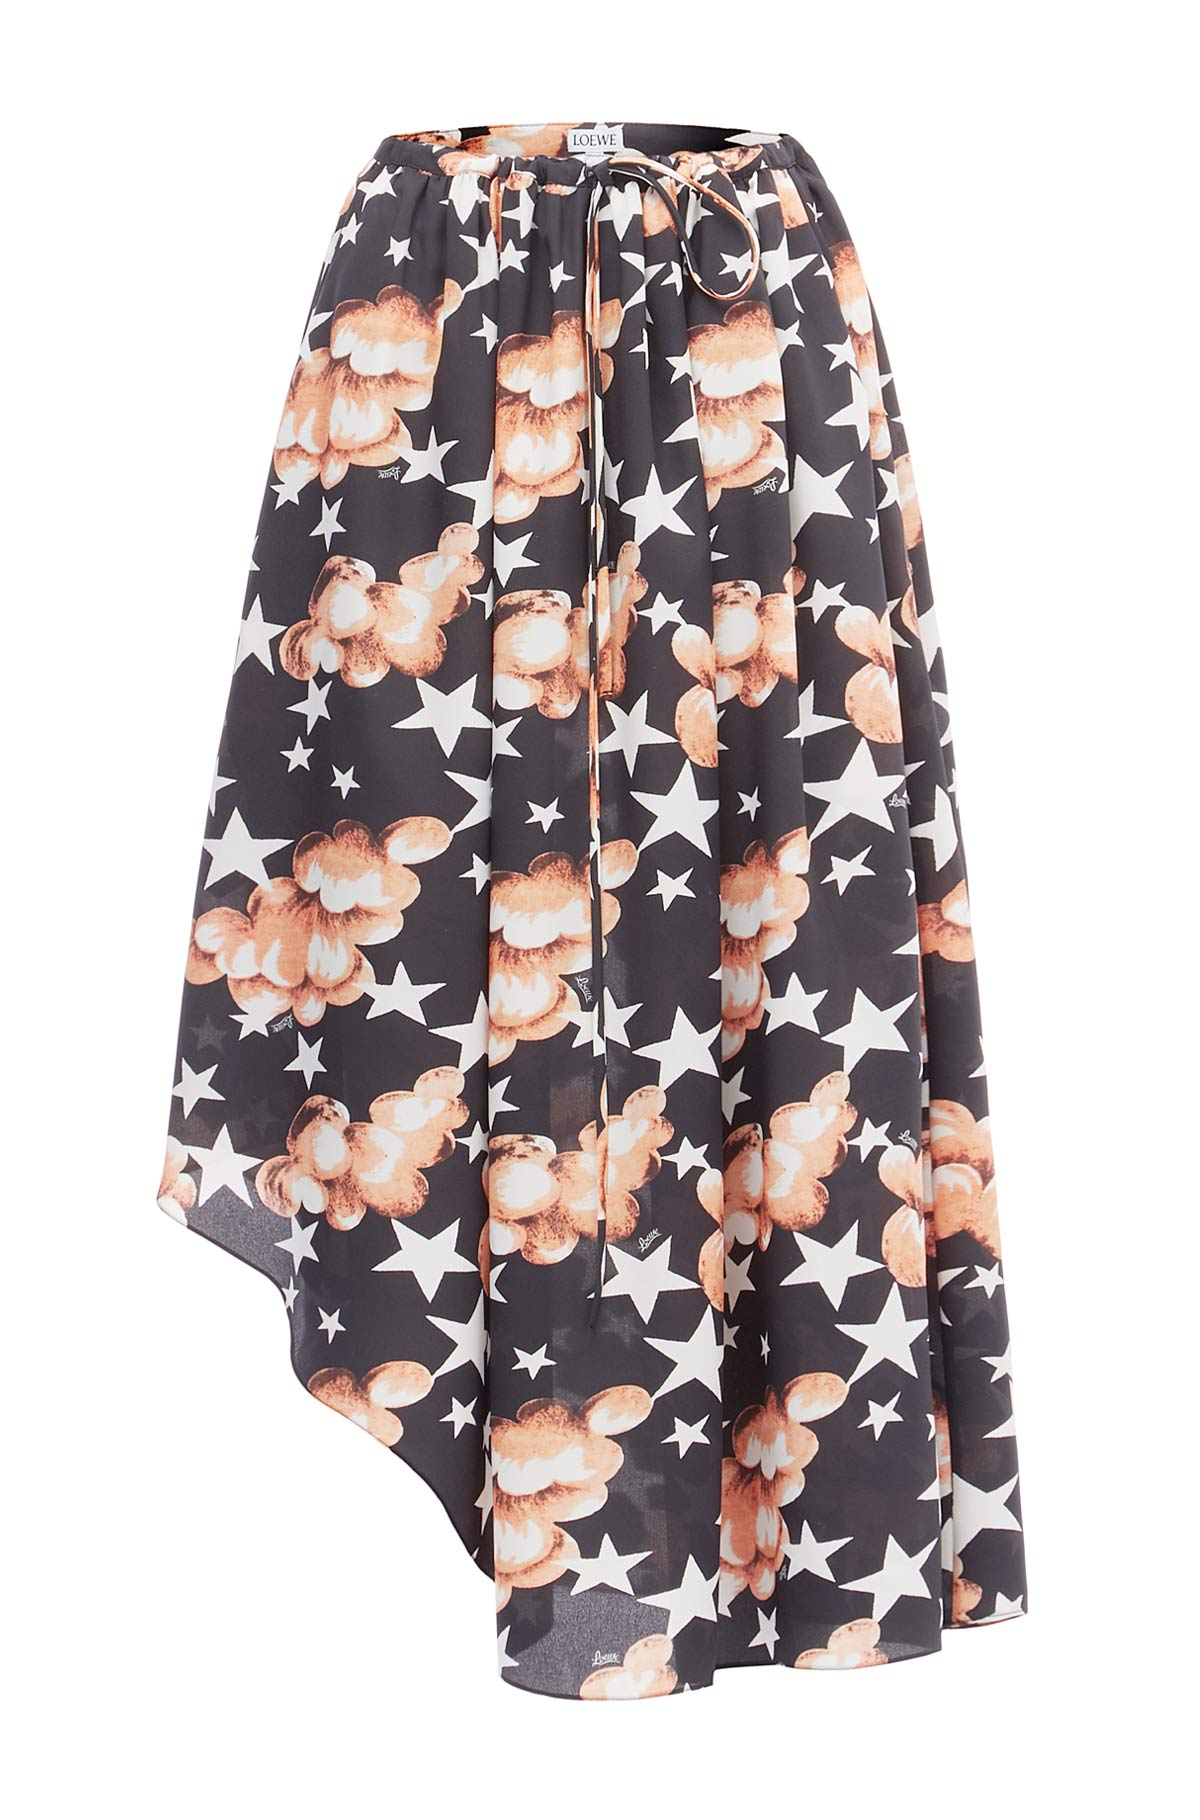 LOEWE Stars Asymmetric Skirt Multicolor front